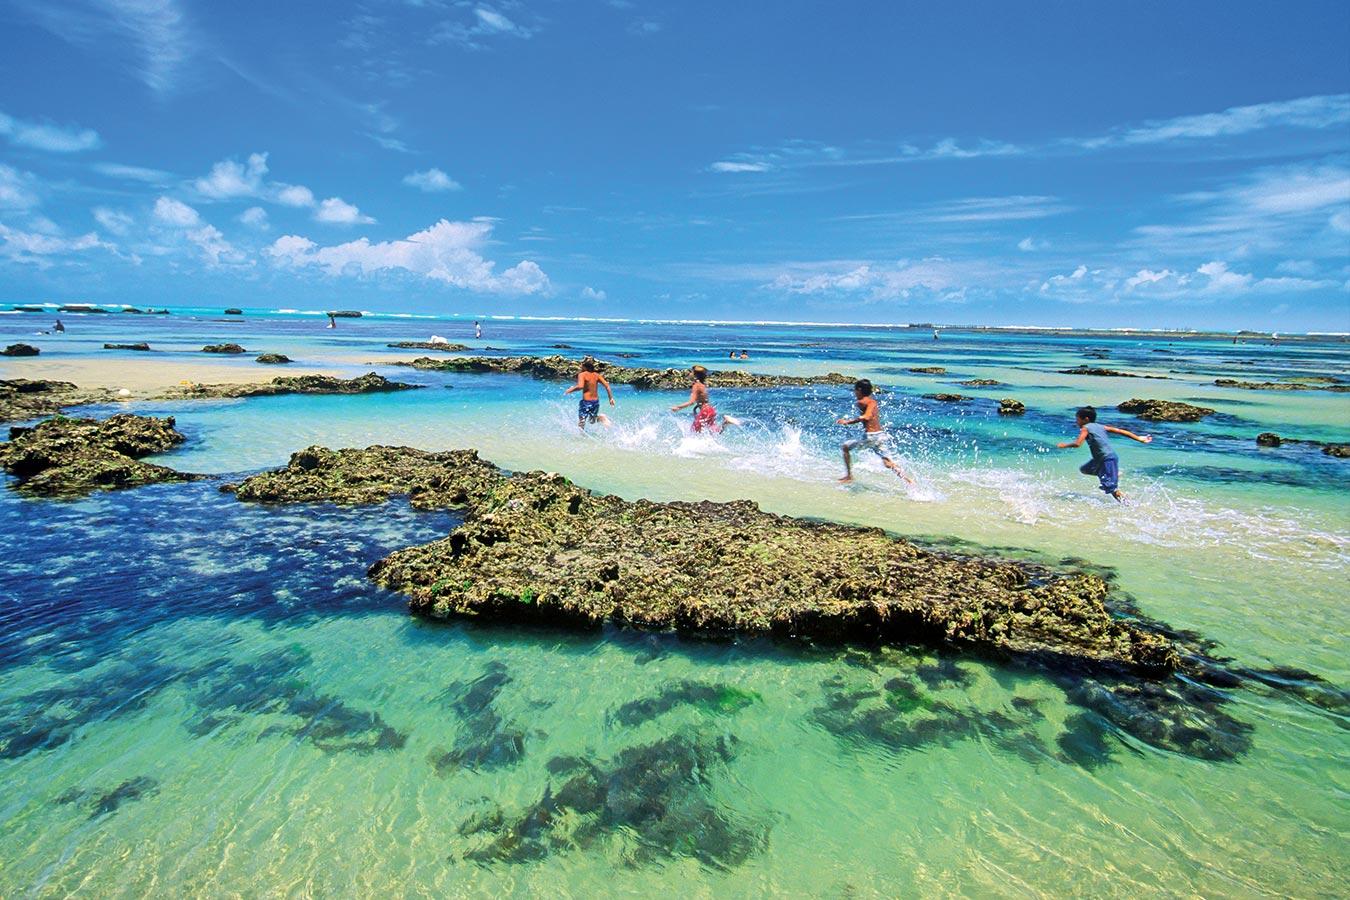 Praia de Guajiru